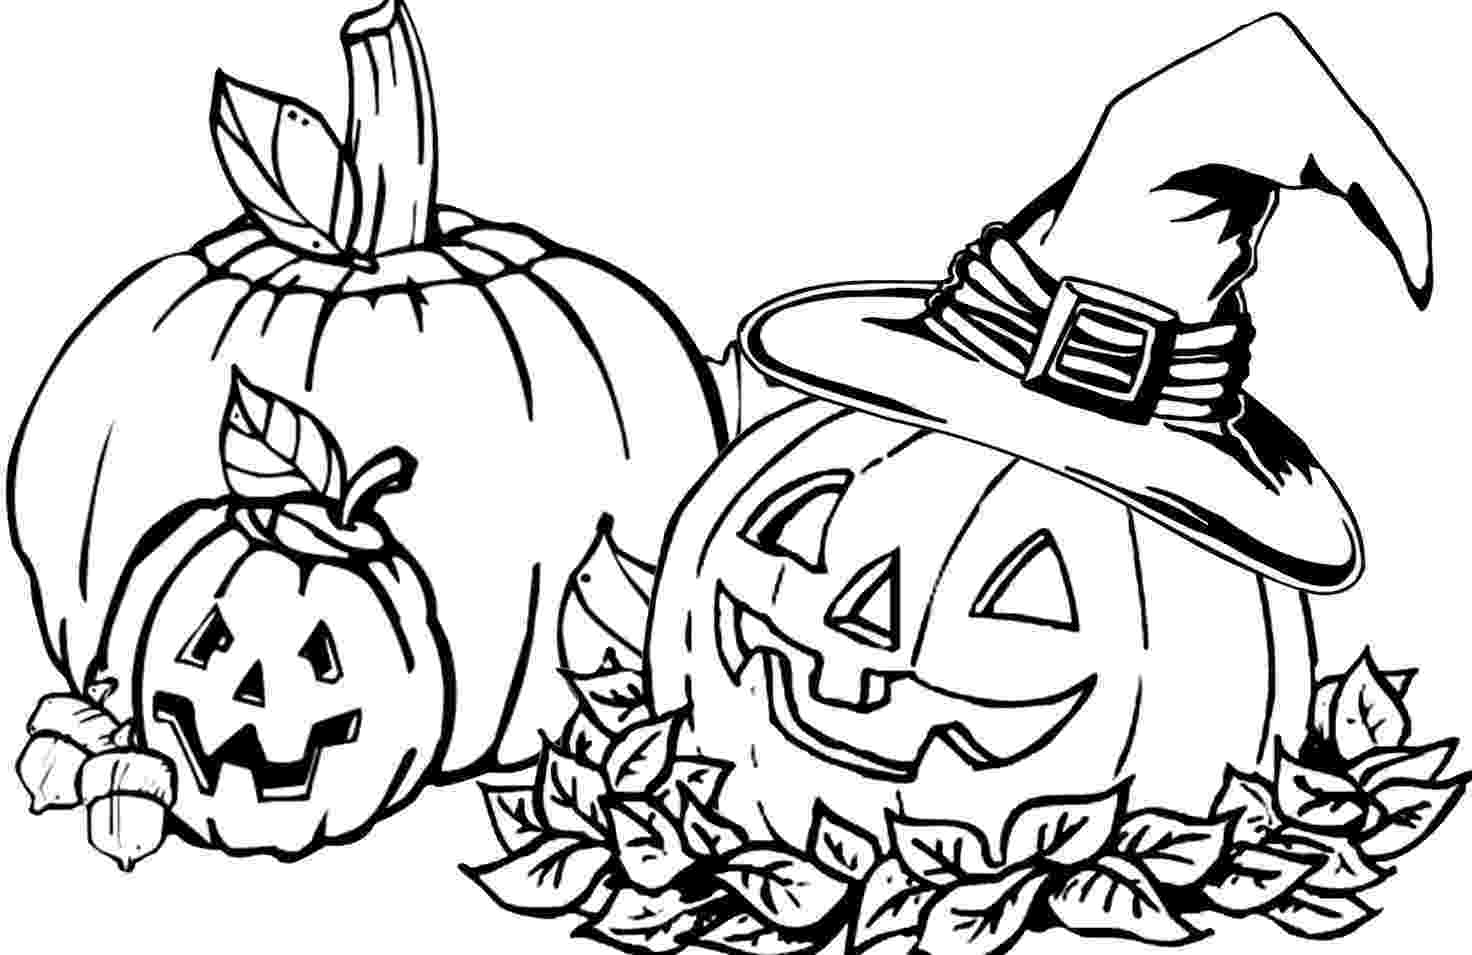 halloween pumpkins to color and print halloween pumpkin coloring pages getcoloringpagescom and print halloween to color pumpkins